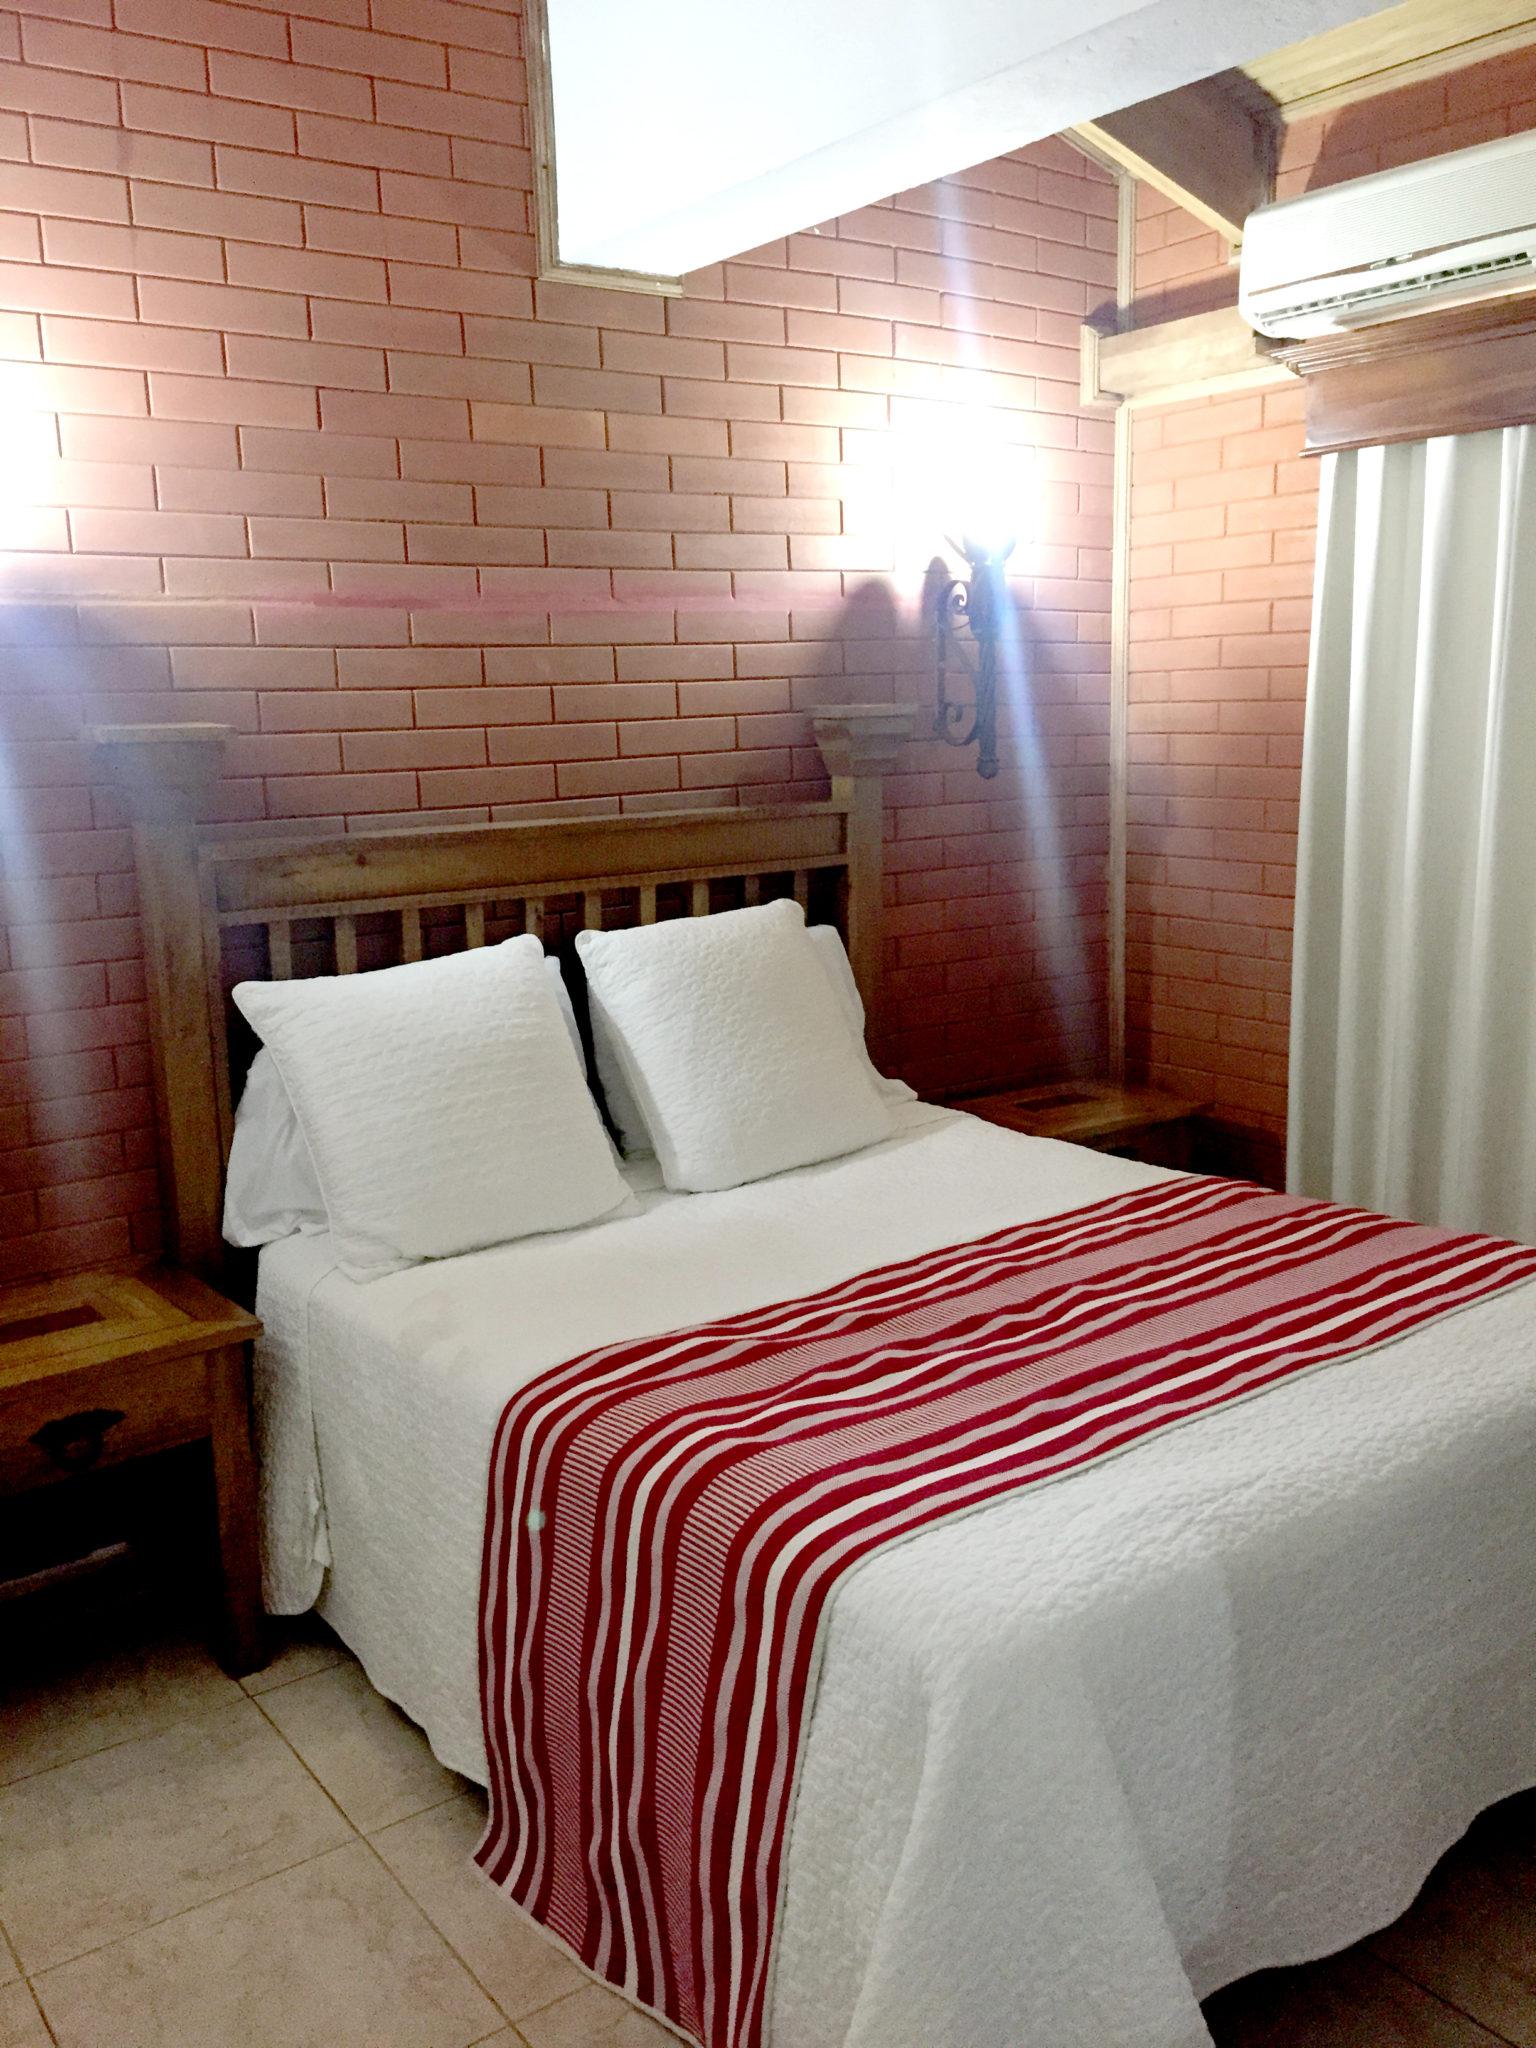 Republique_dominicaine_mes_bonnes_adresses_jarabacoa_hotel_brisas_del_yaque